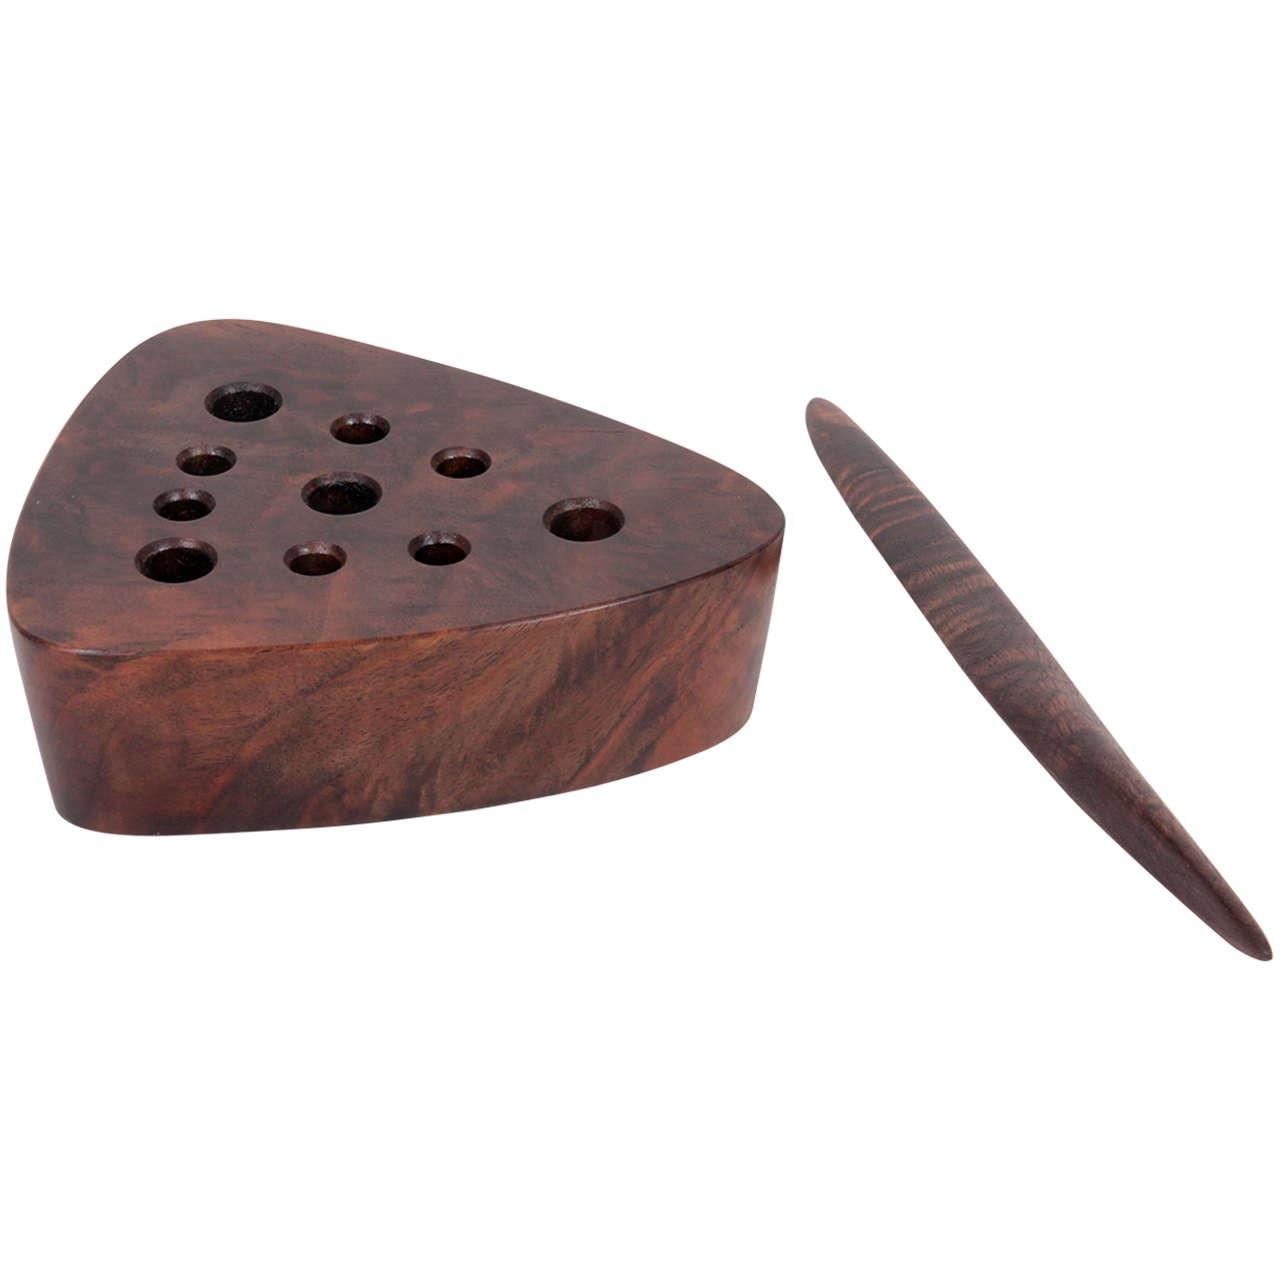 mira nakashima pen pencil holder and letter opener in With letter opener holder